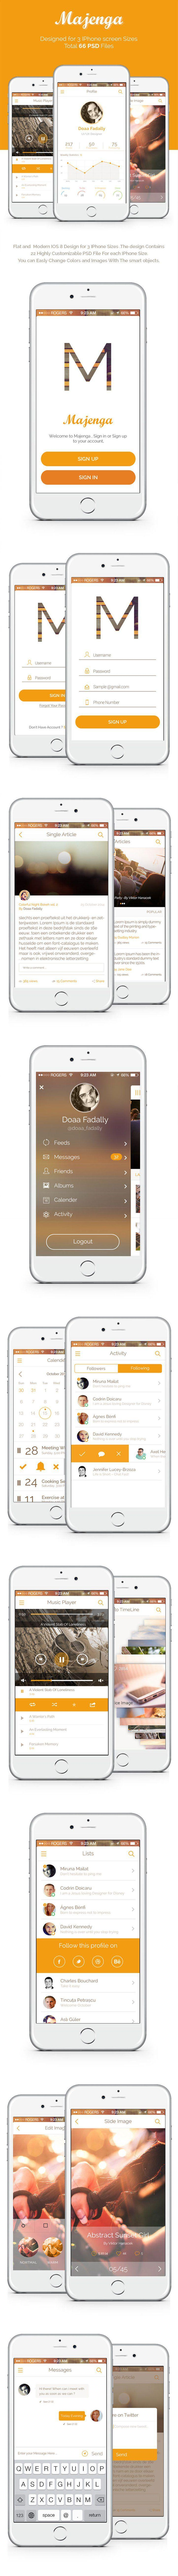 Majenga UI/UX Flat App